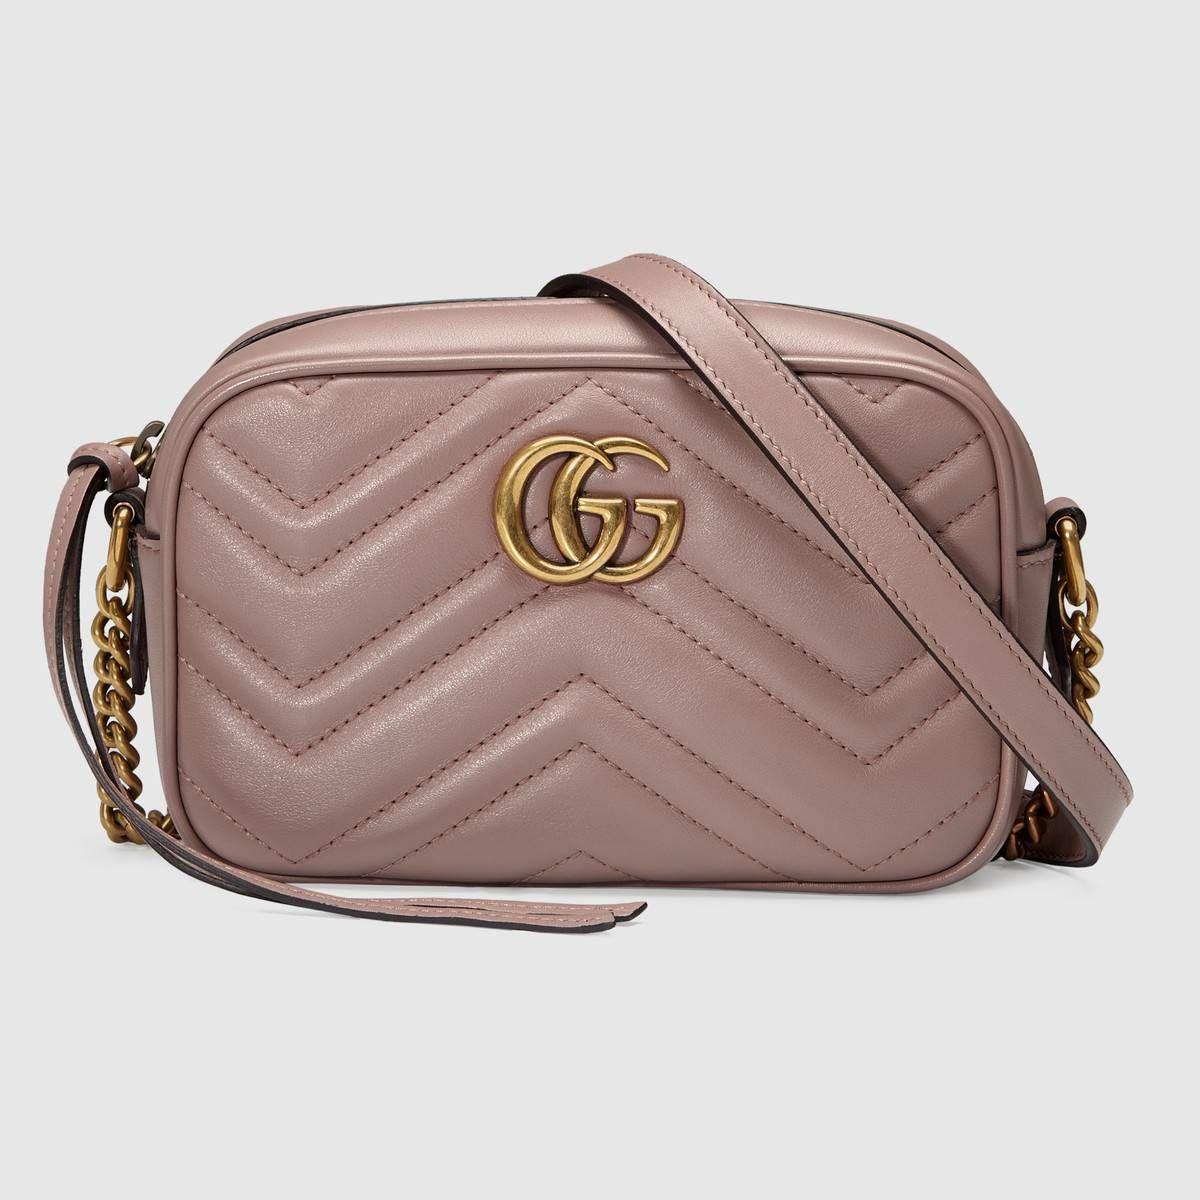 Gucci GG Marmont Matelasse Mini Camera Bag Nude